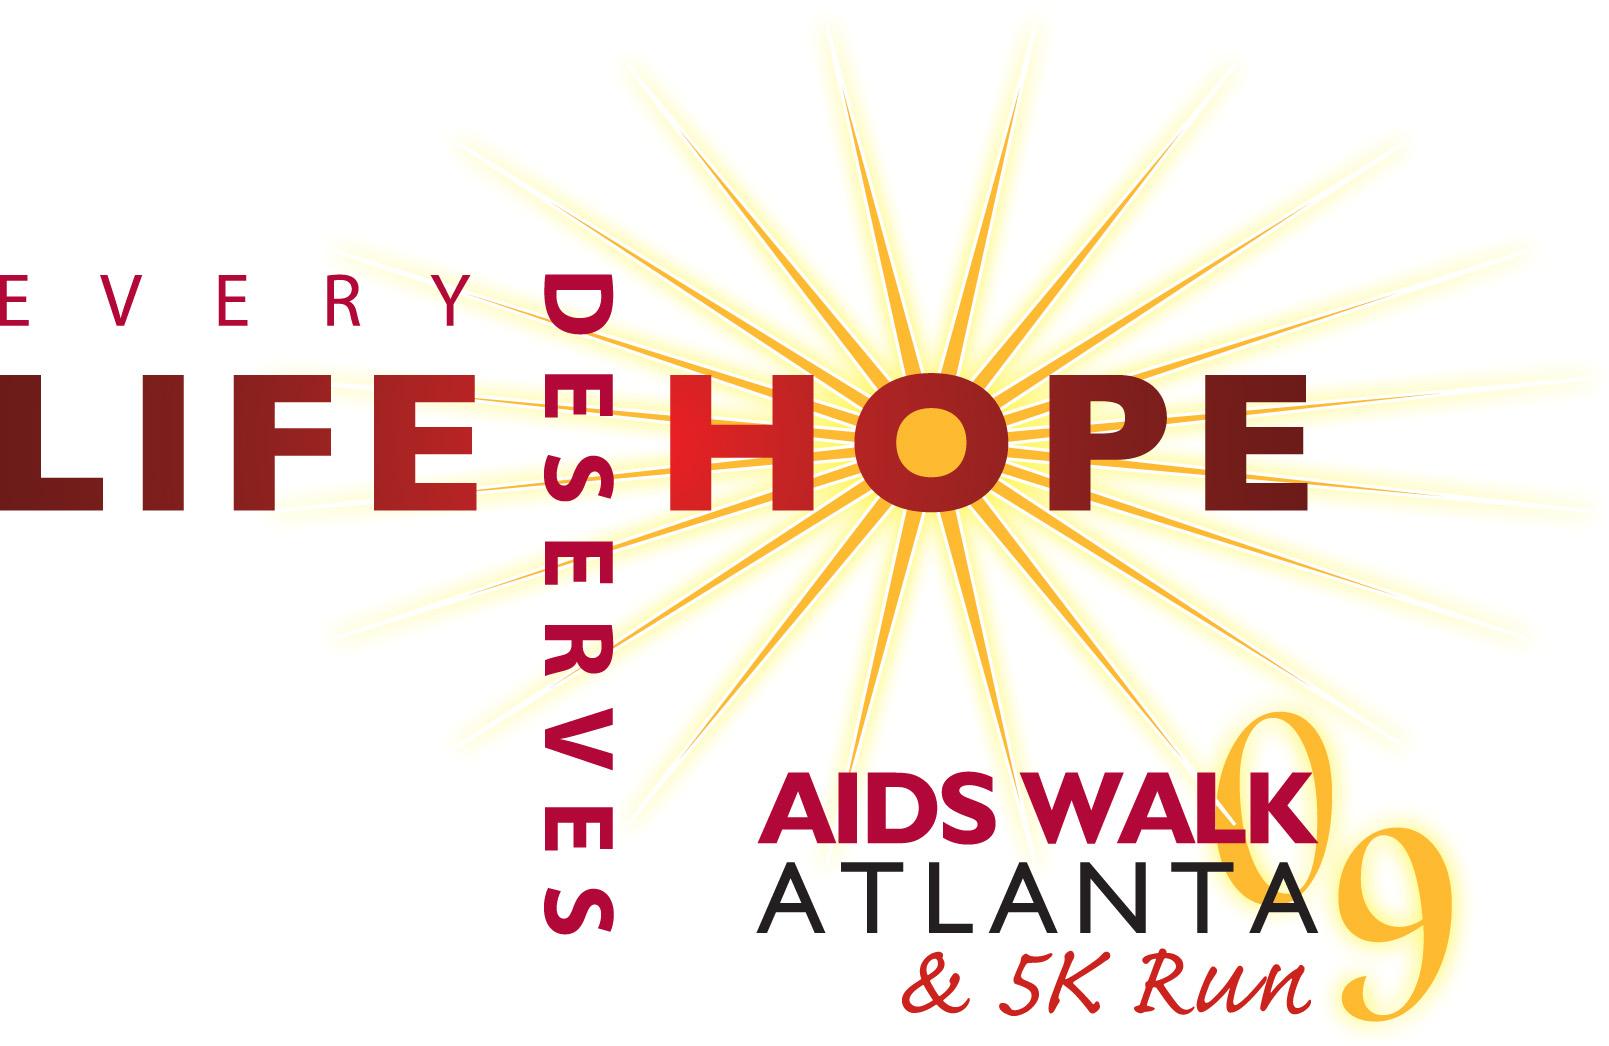 2009 AIDS WALK ATLANTA